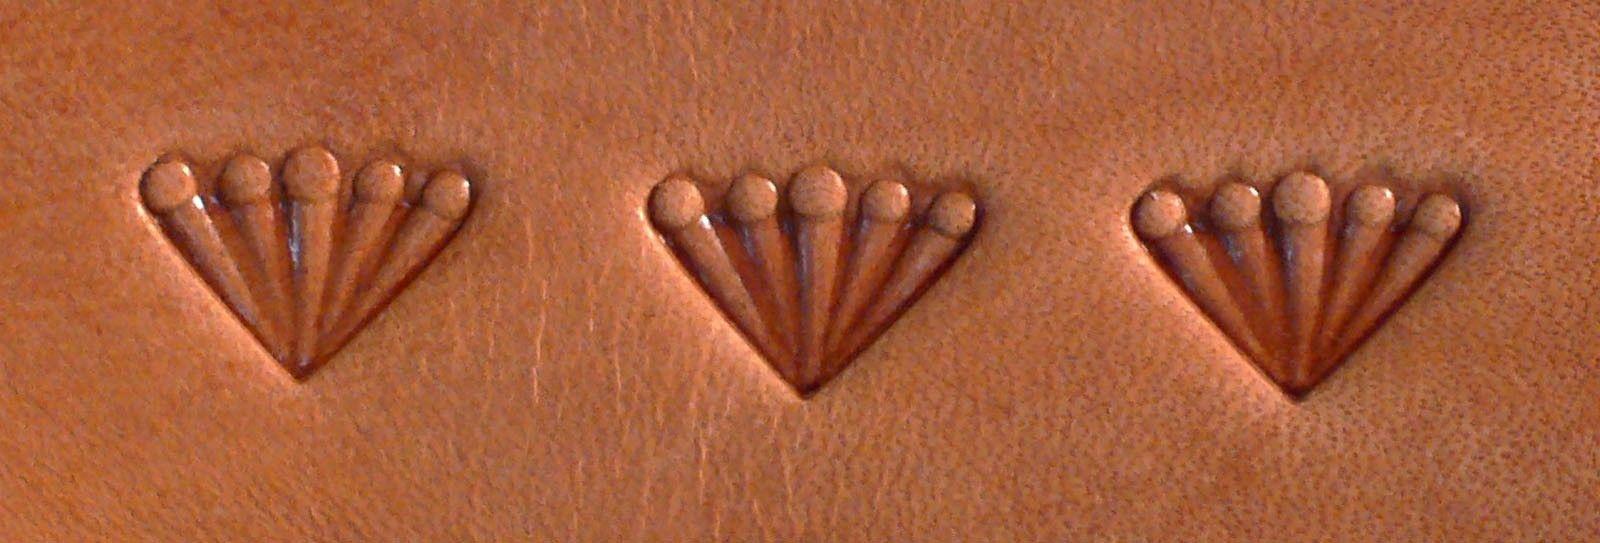 Custom Made Welker Handmade Leather Stamps W 160